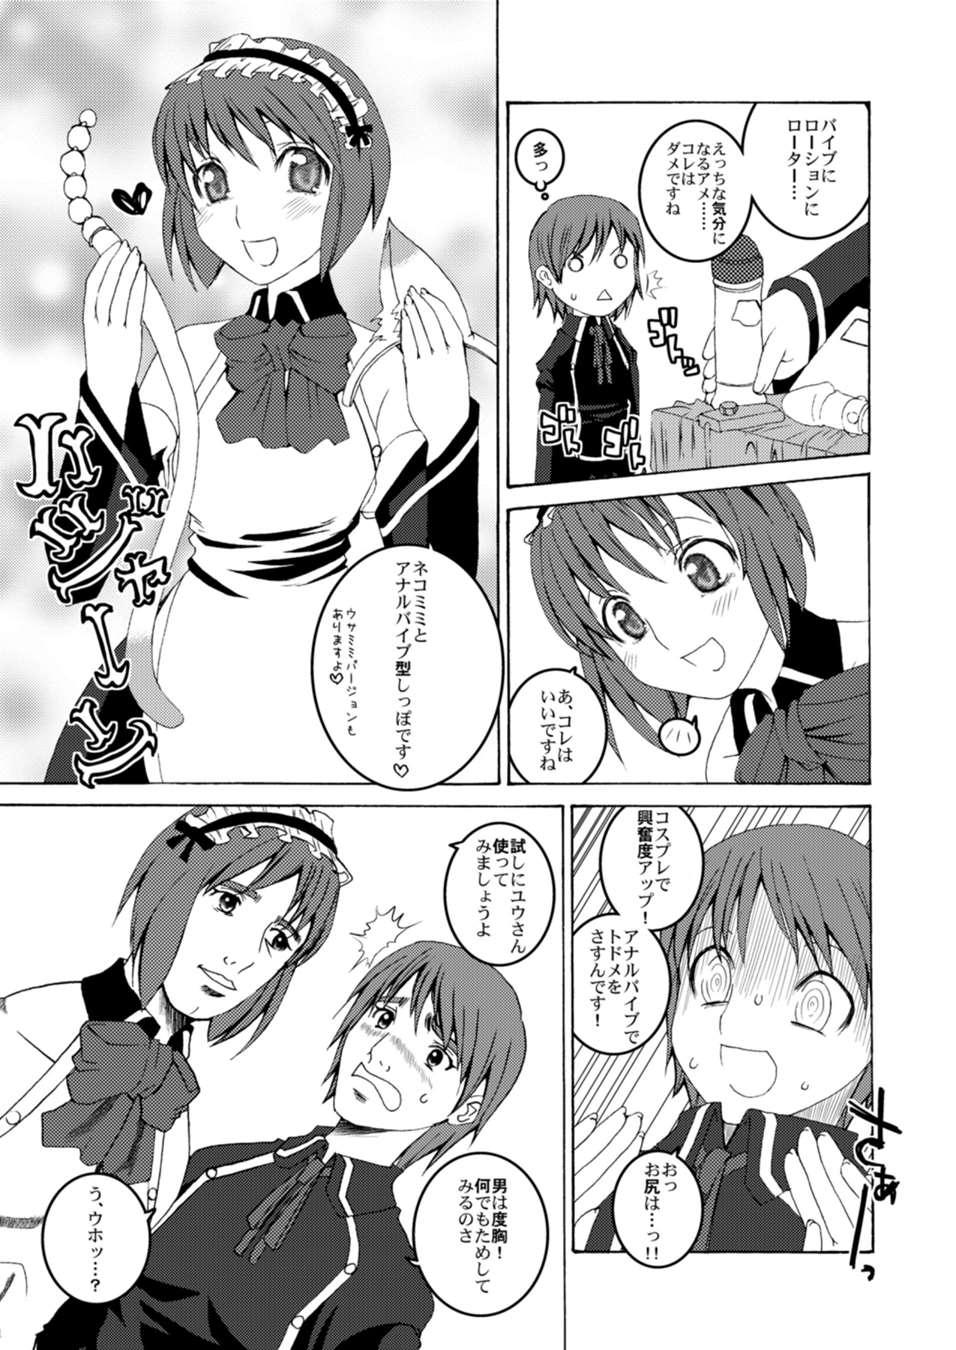 U-REI GIRL SENTIMENTAL FIGHT 2